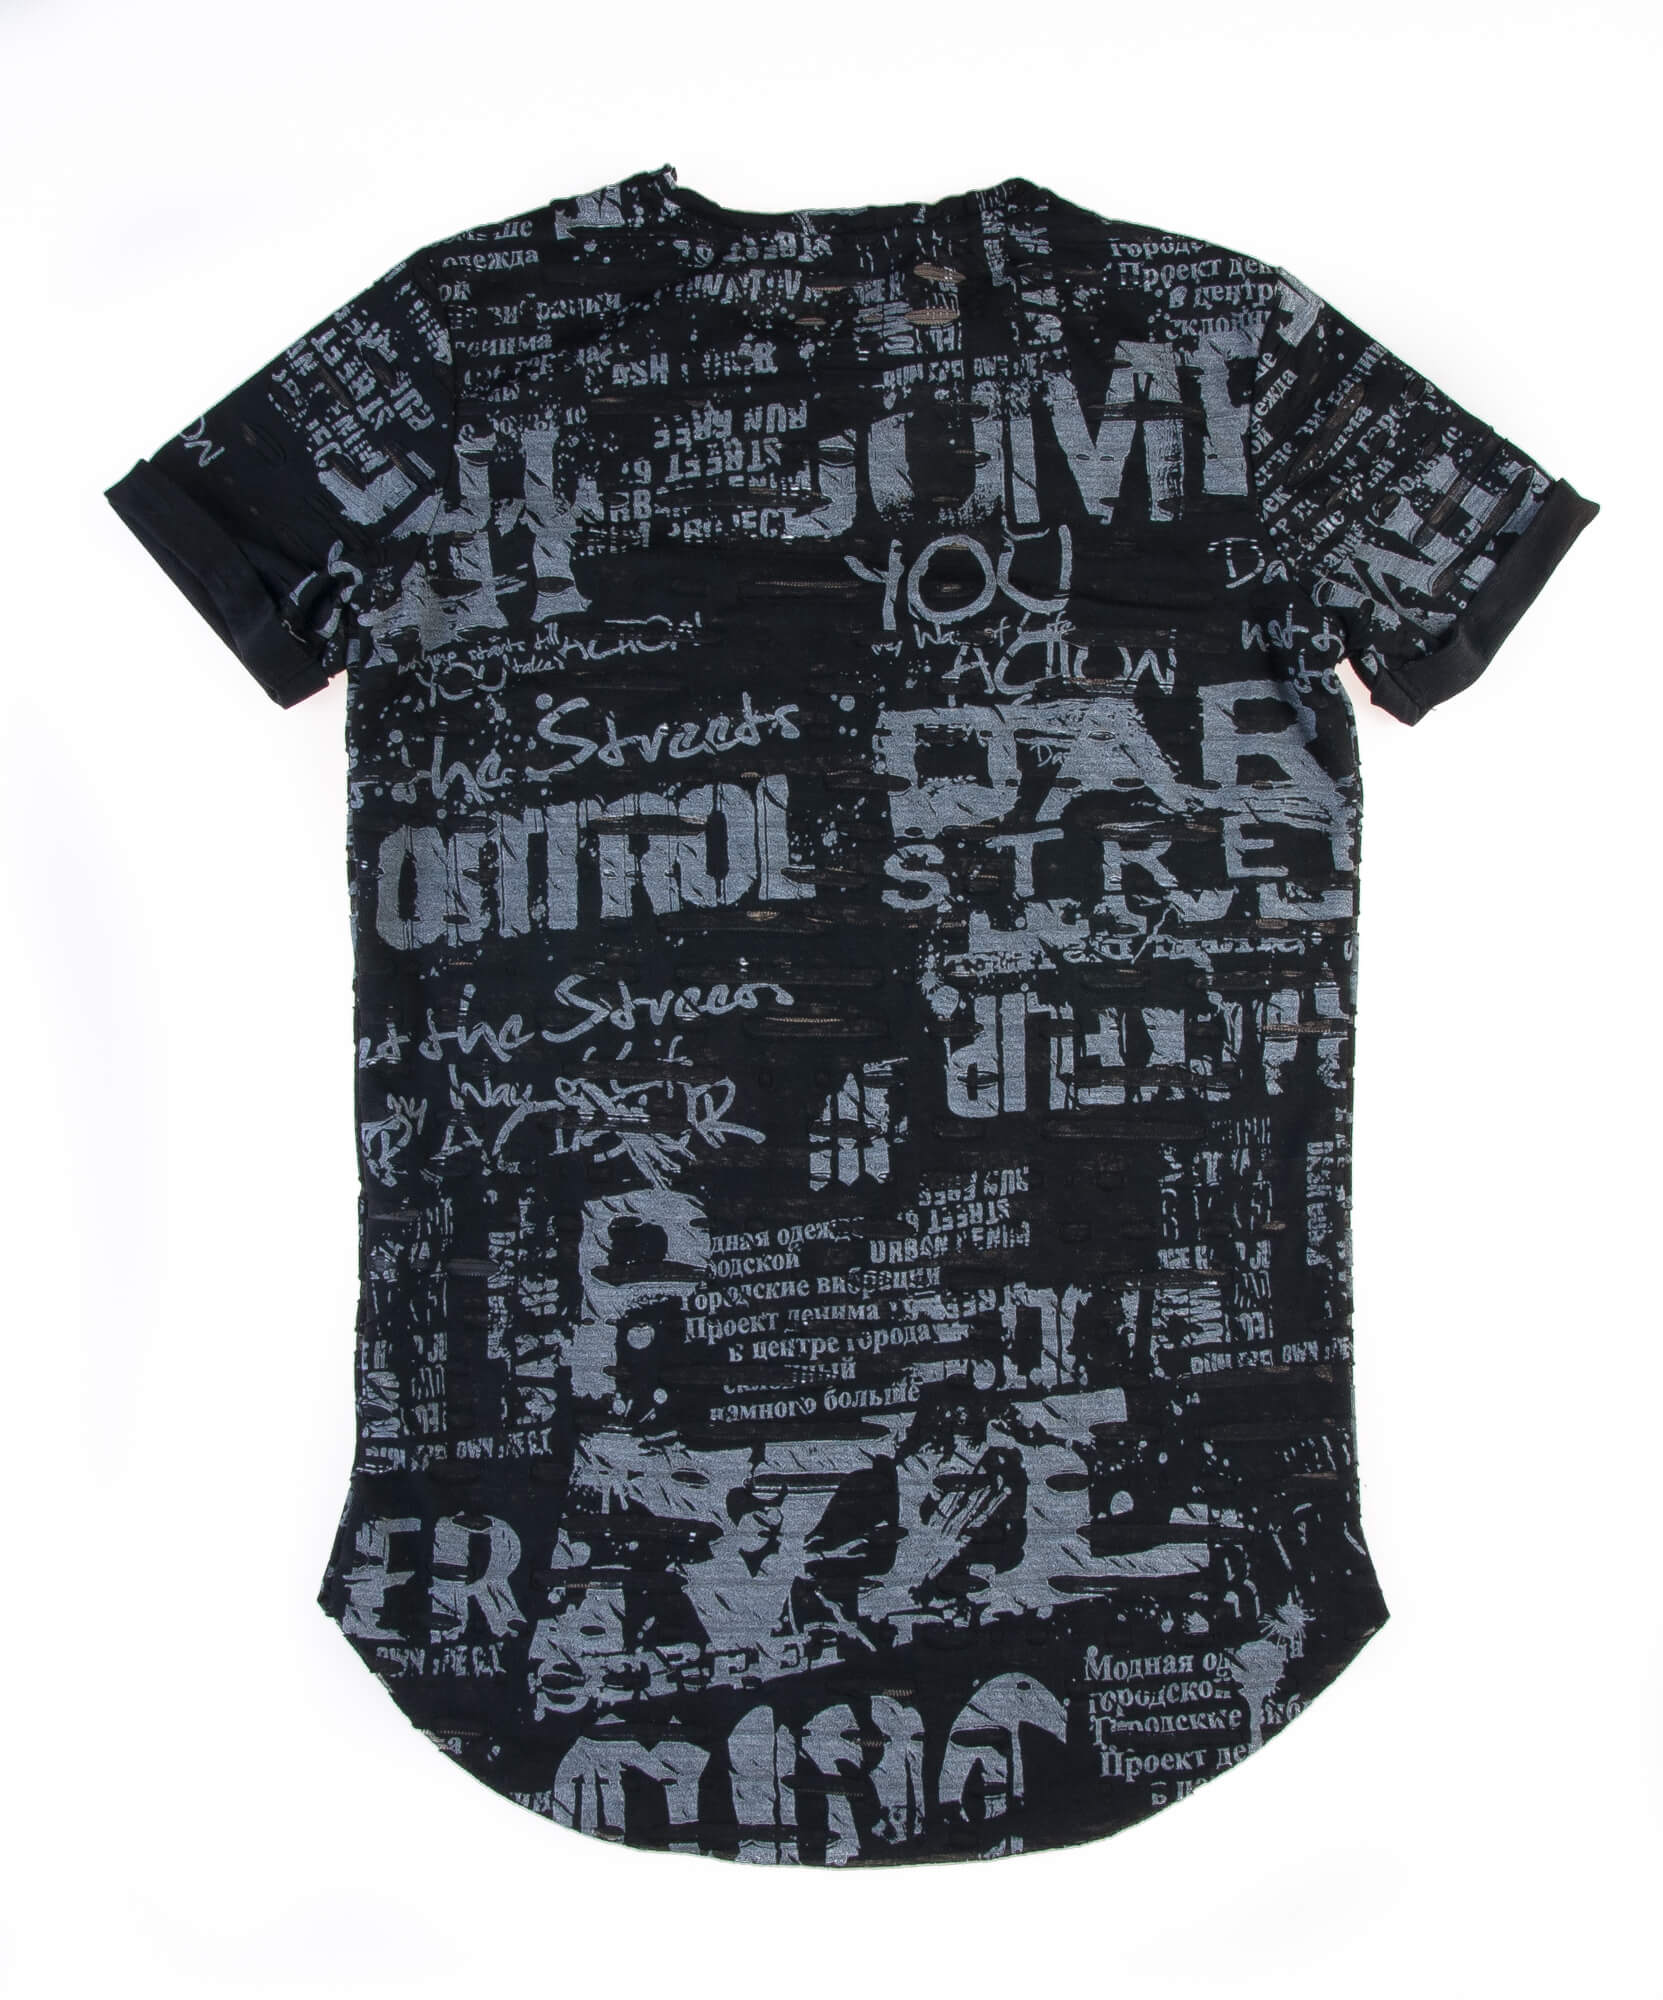 تی شرت مردانه برند ماچ مور S1026- MUCH MORE